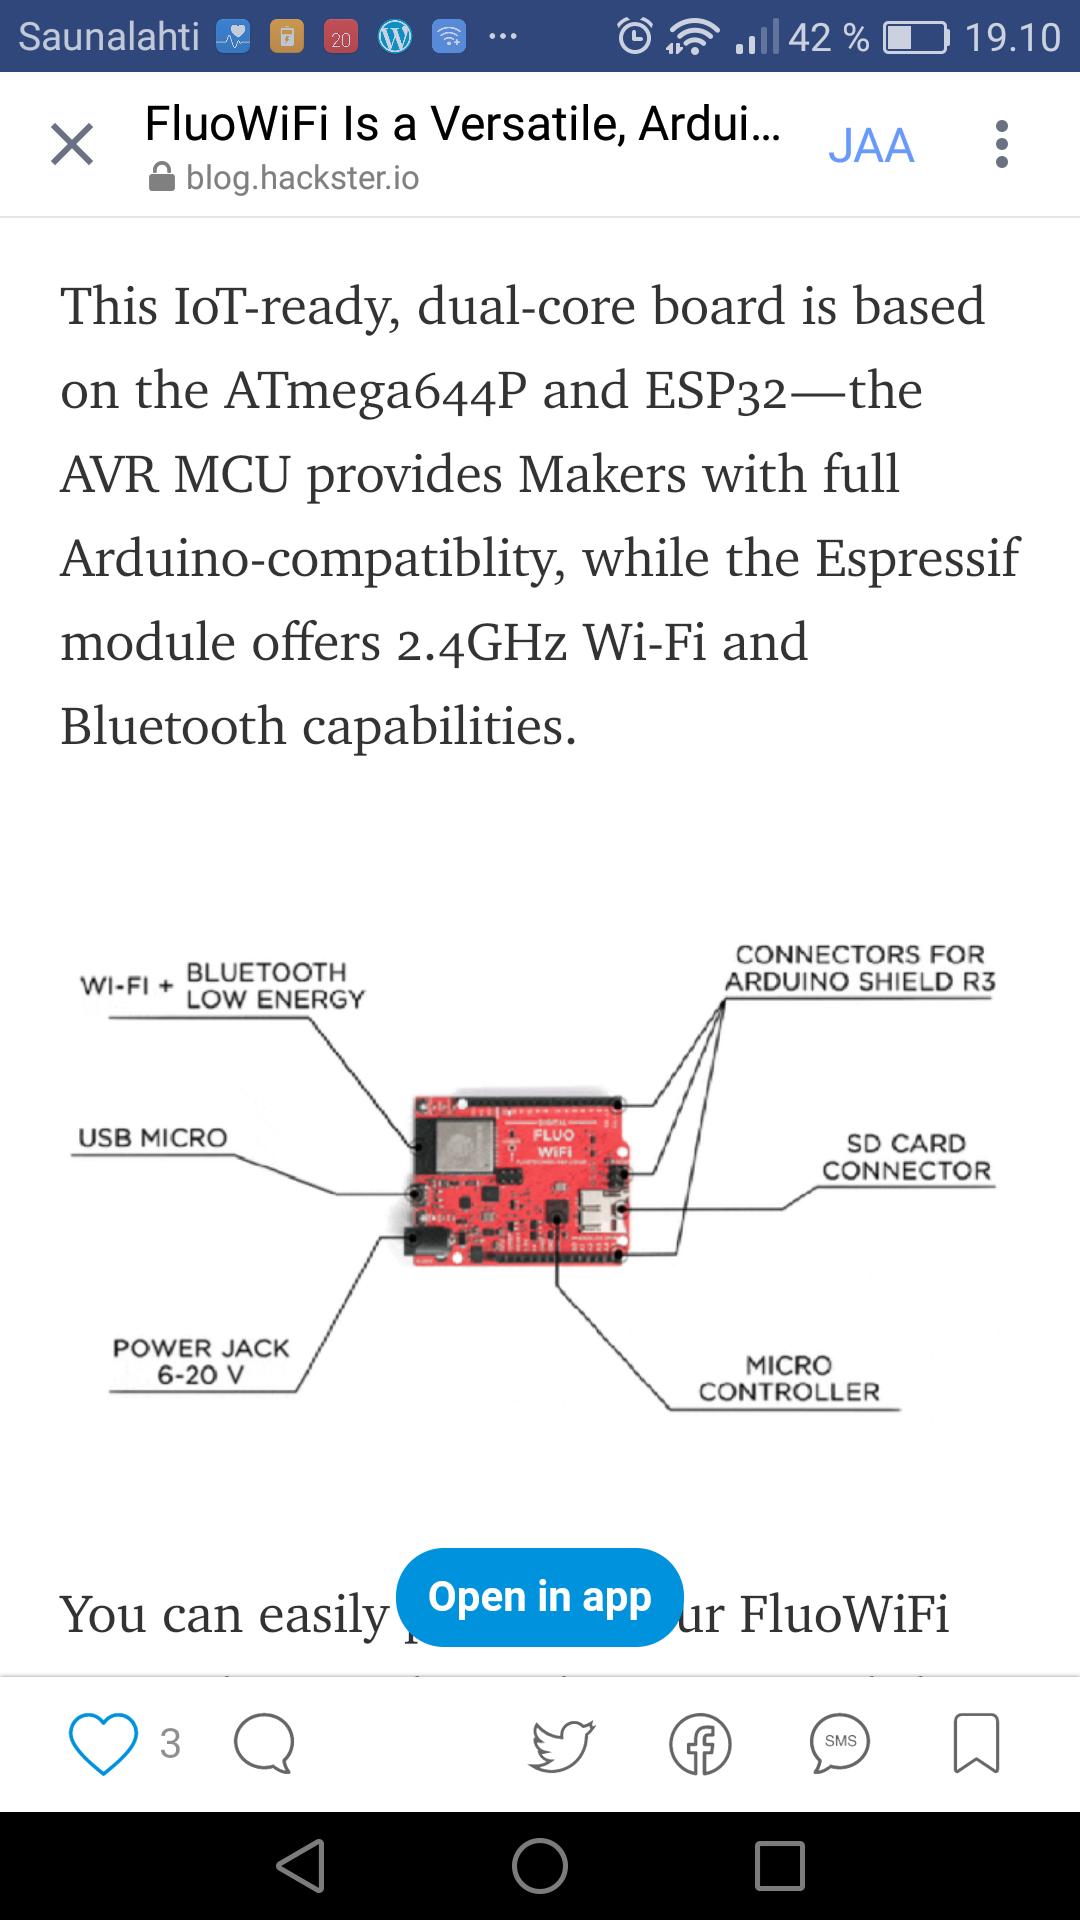 Fluowifi is a versatile arduino compatible iot board